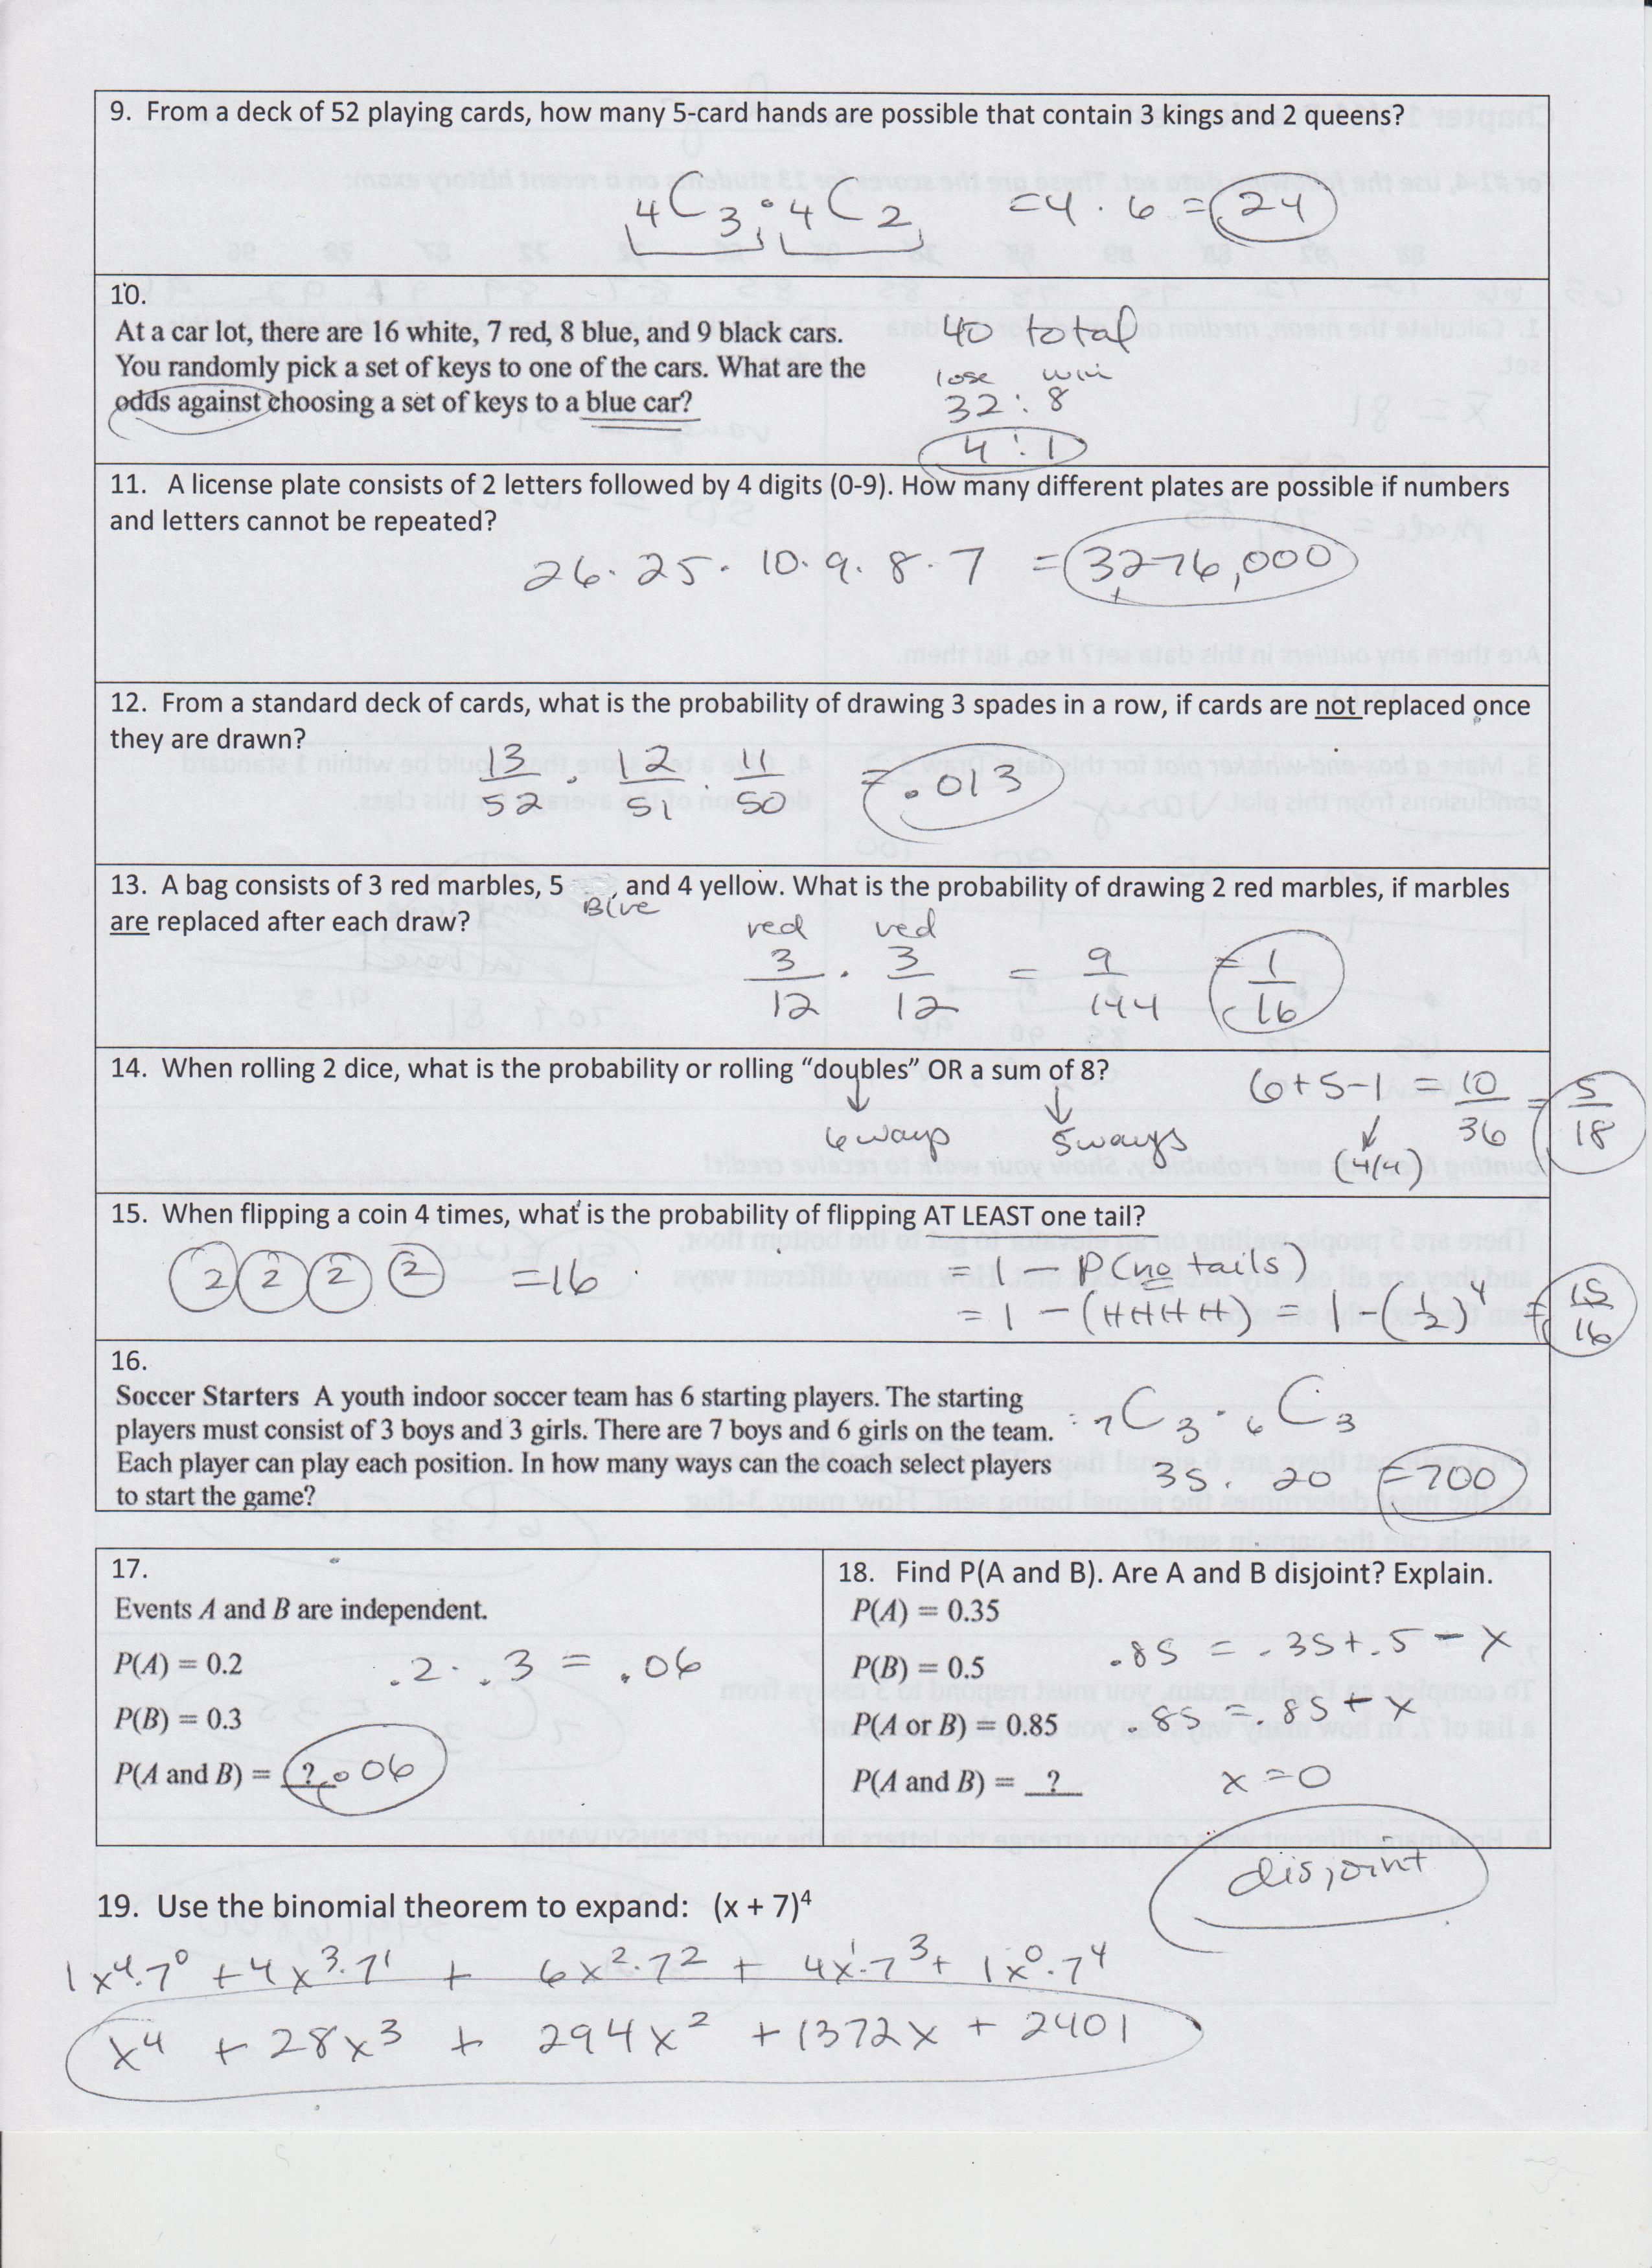 Anderson, Lisa - Mathematics / Algebra 2 (per 5 and 6)